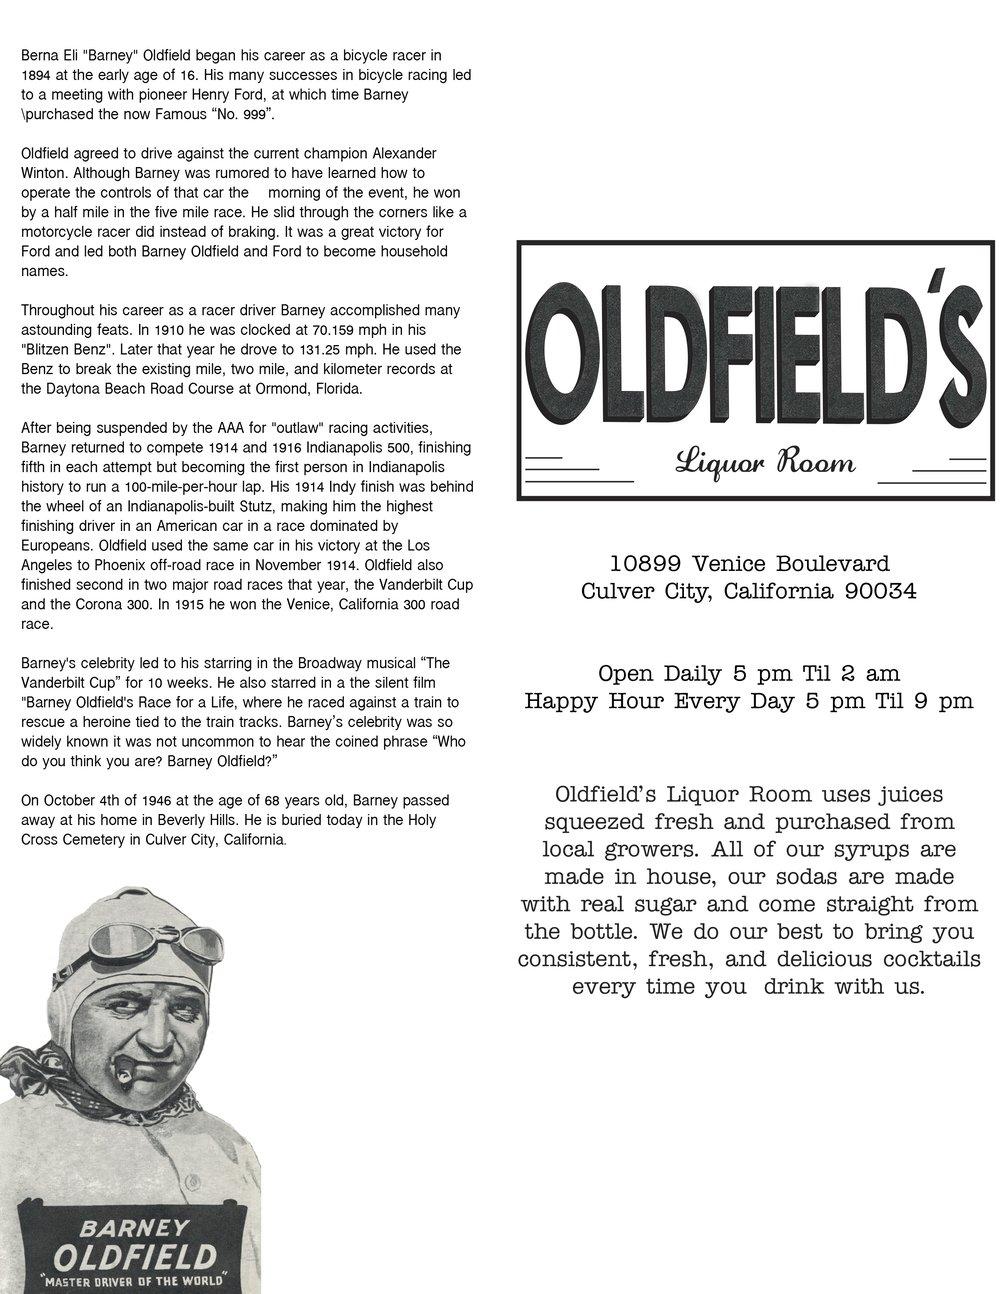 Oldfields.jpg